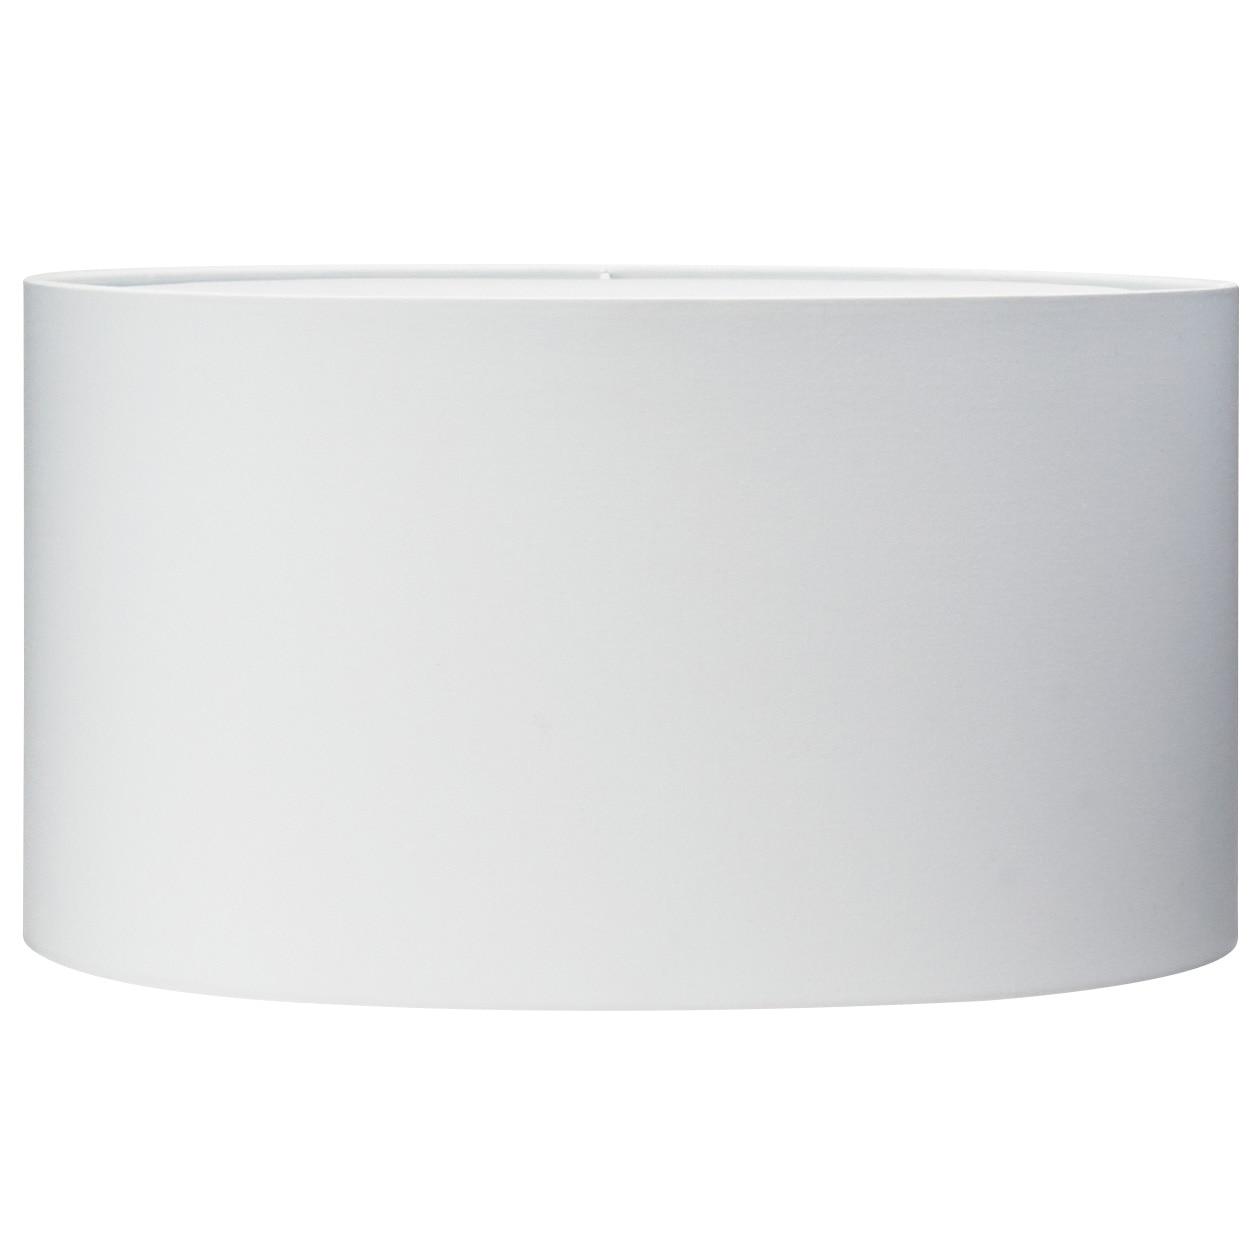 RoomClip商品情報 - フロアライト用シェード・楕円/シェード:プレーン